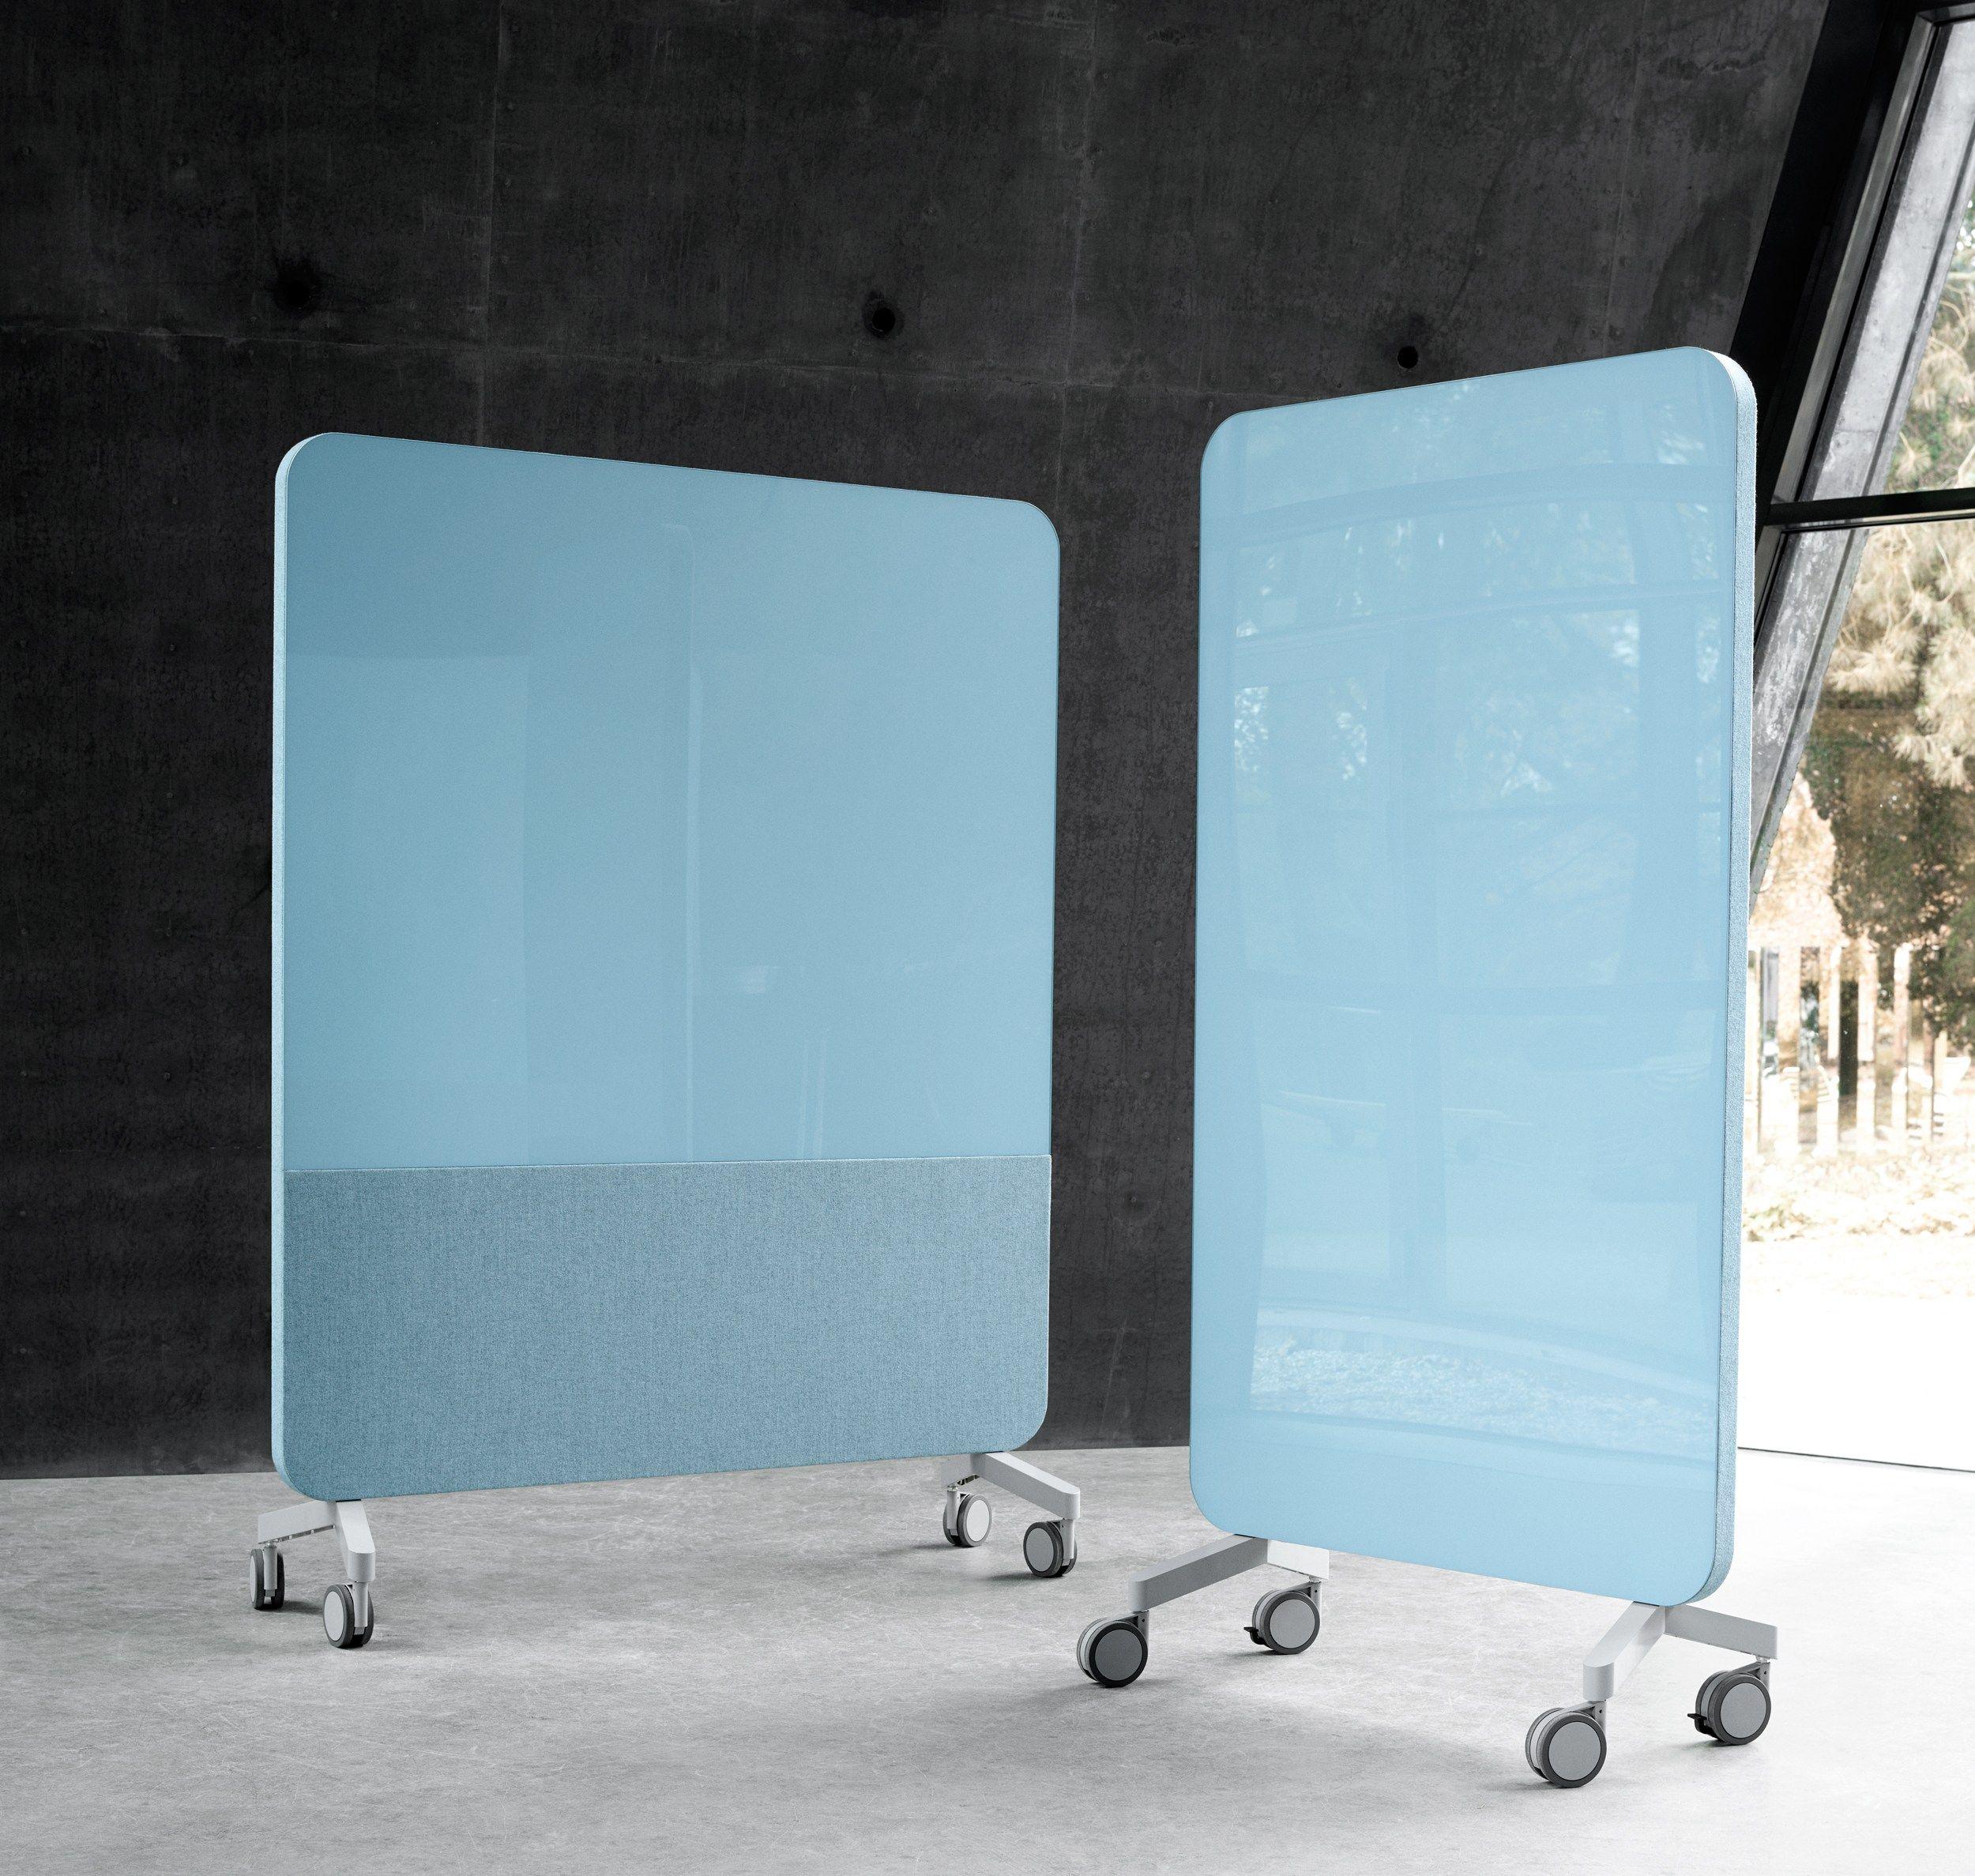 tableau blanc magn tique roulettes mood fabric mobile by lintex design matti klenell. Black Bedroom Furniture Sets. Home Design Ideas